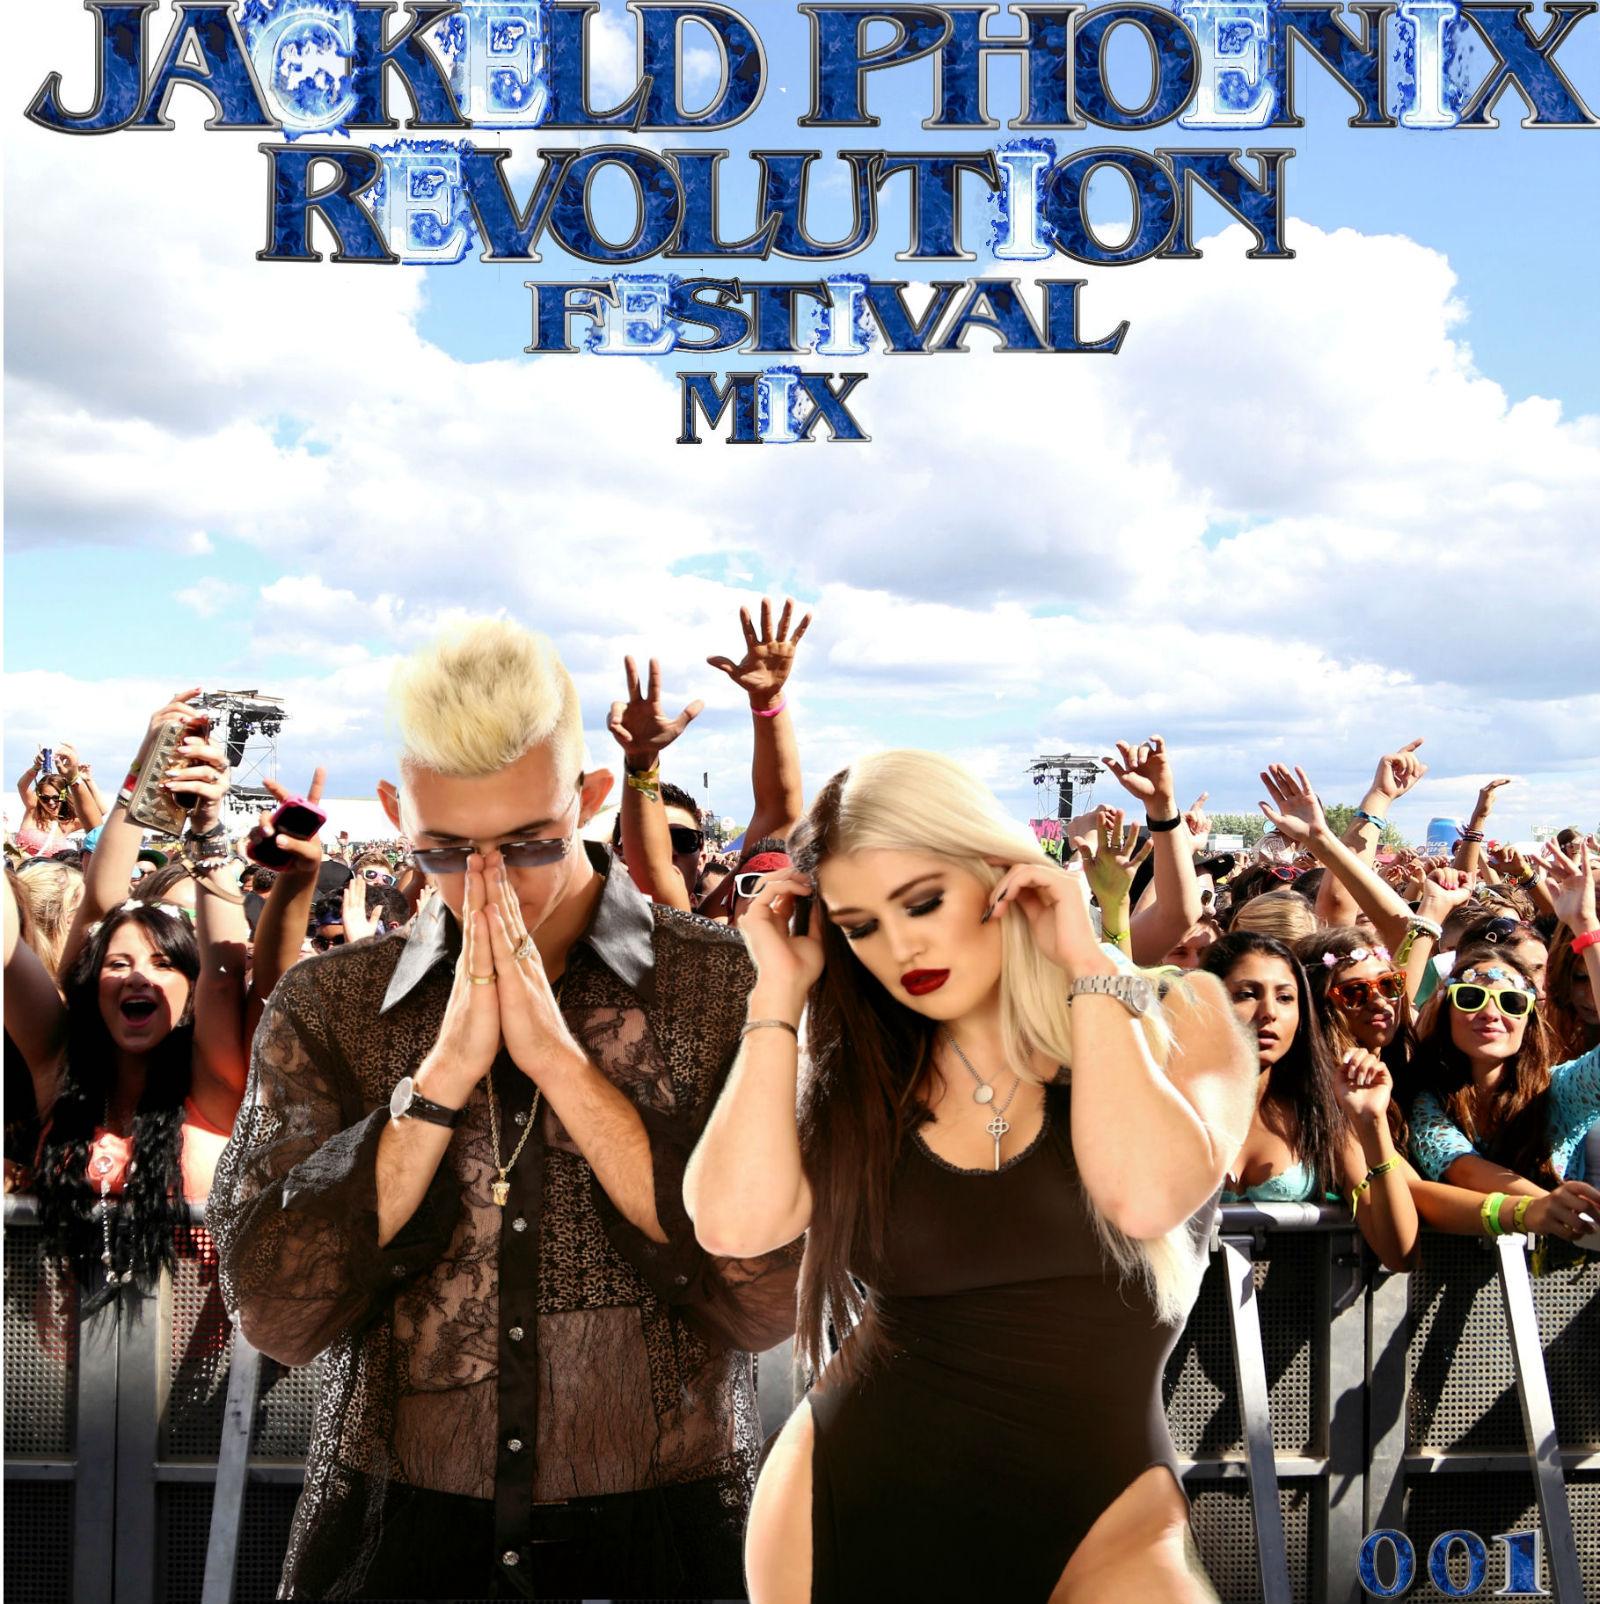 Revolution Festival Mix